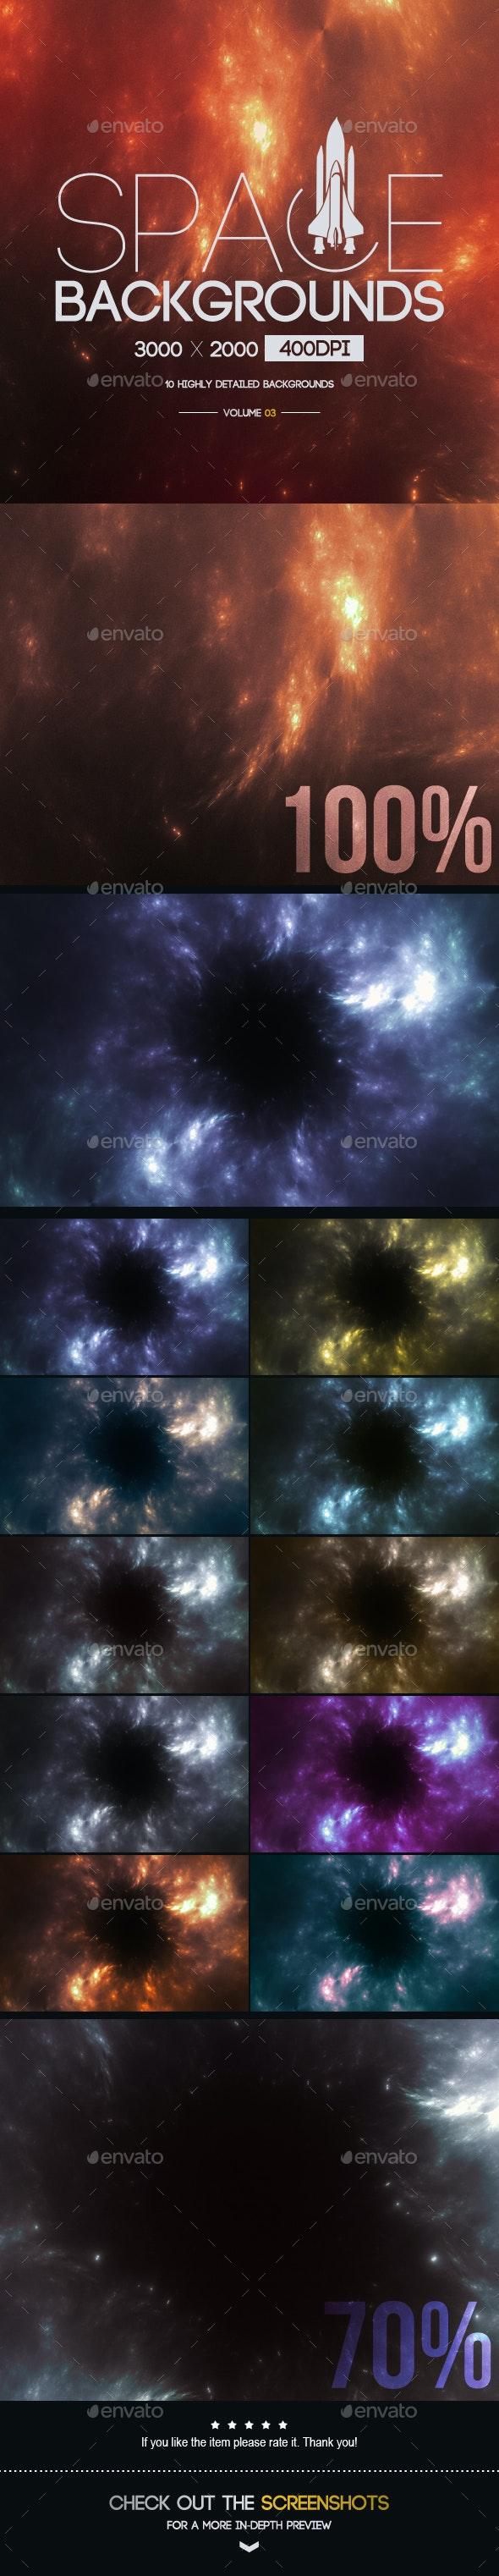 Space Backgrounds [Vol.3] - Tech / Futuristic Backgrounds